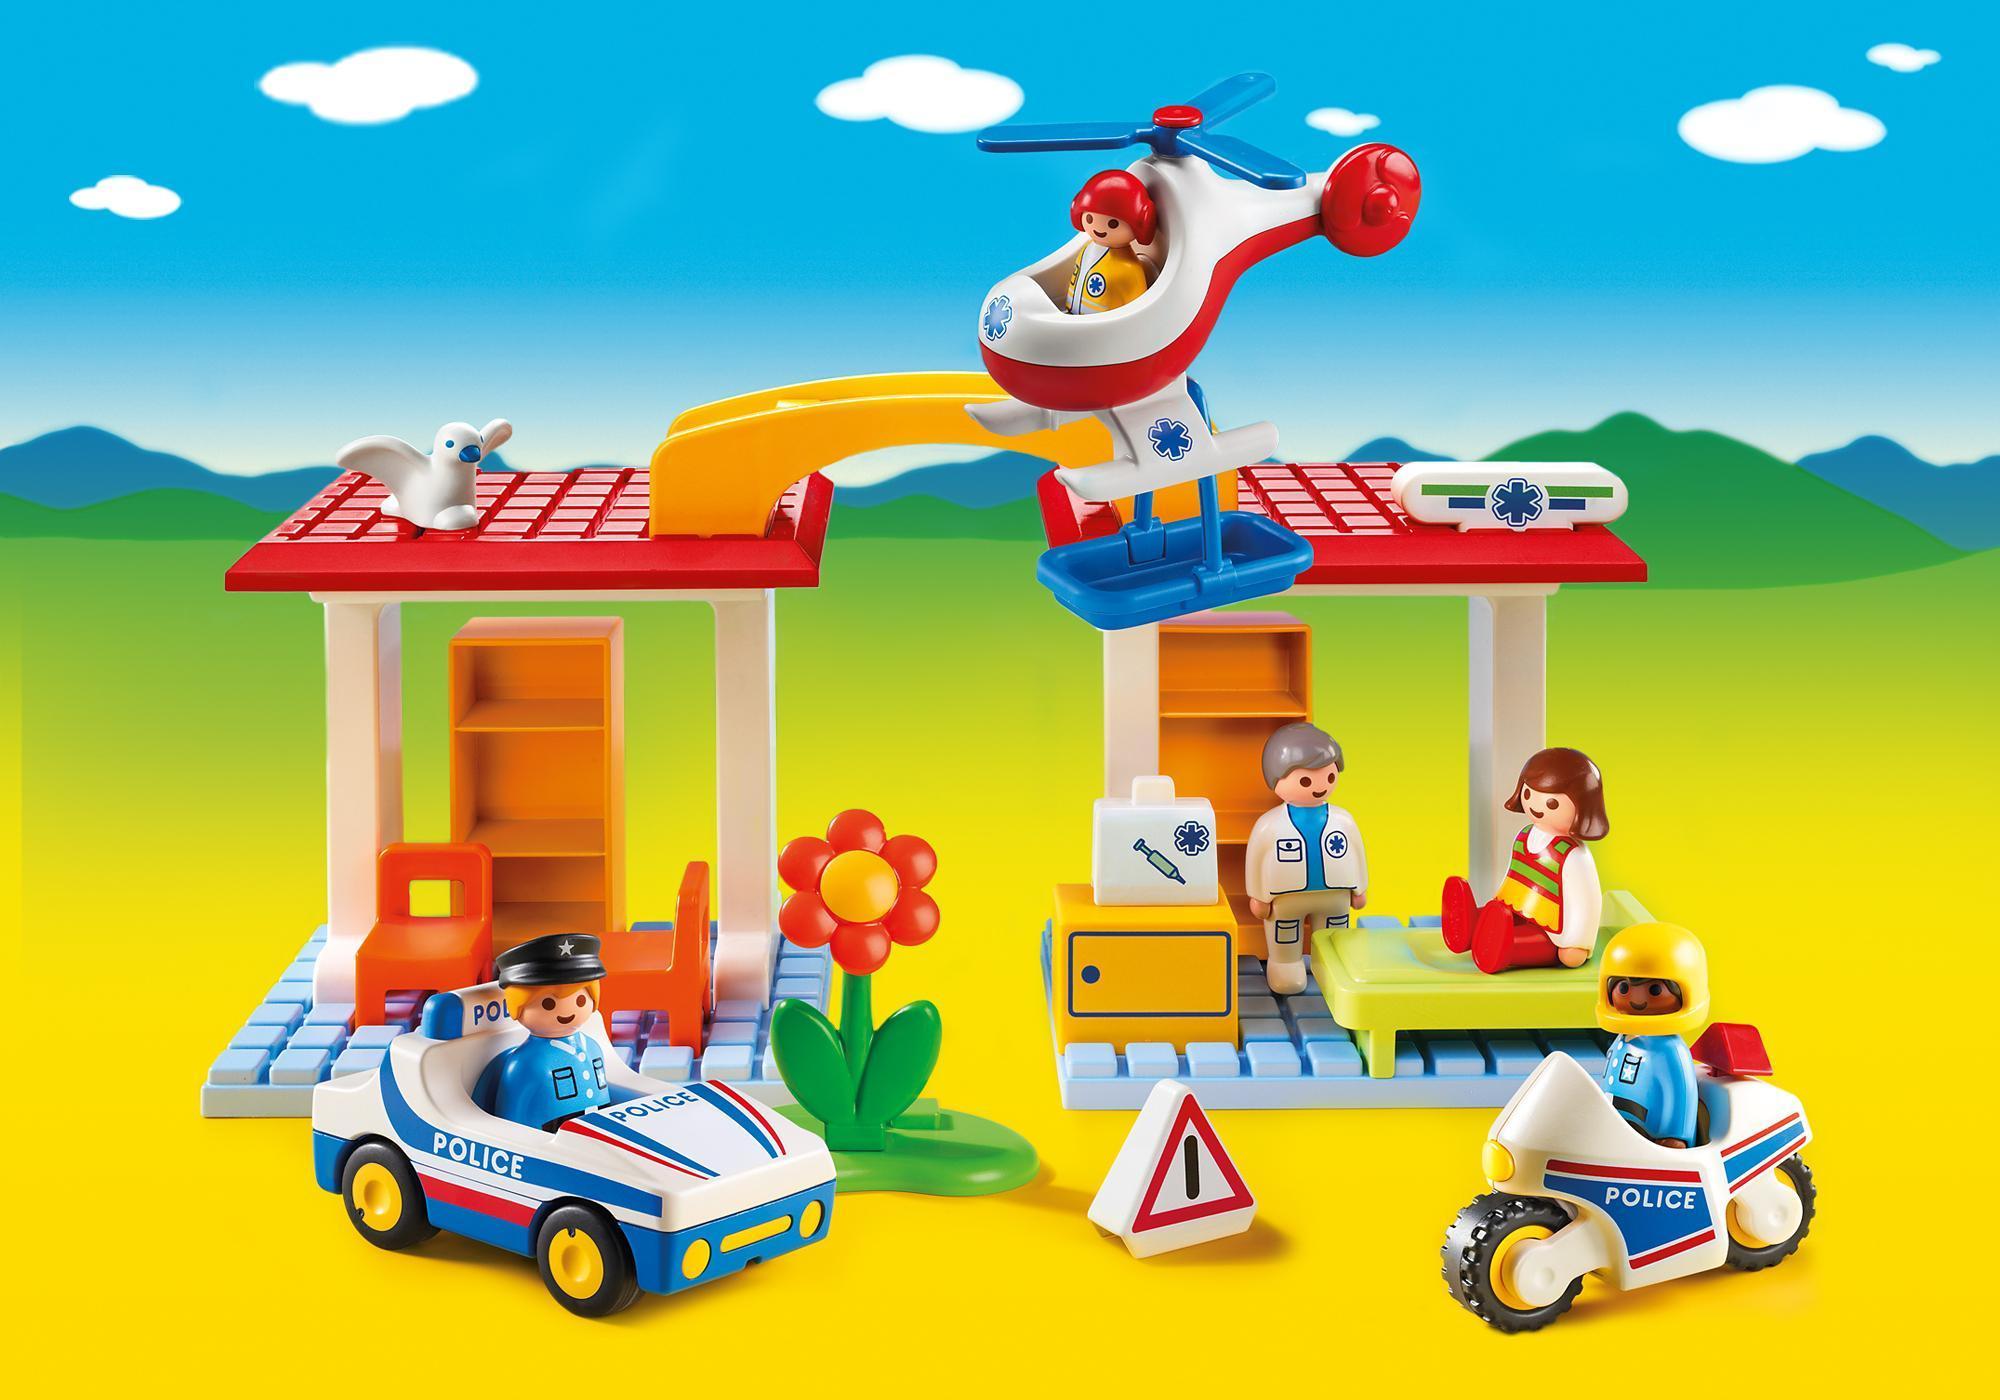 http://media.playmobil.com/i/playmobil/5046_product_detail/Polizei und Ambulanz 1.2.3